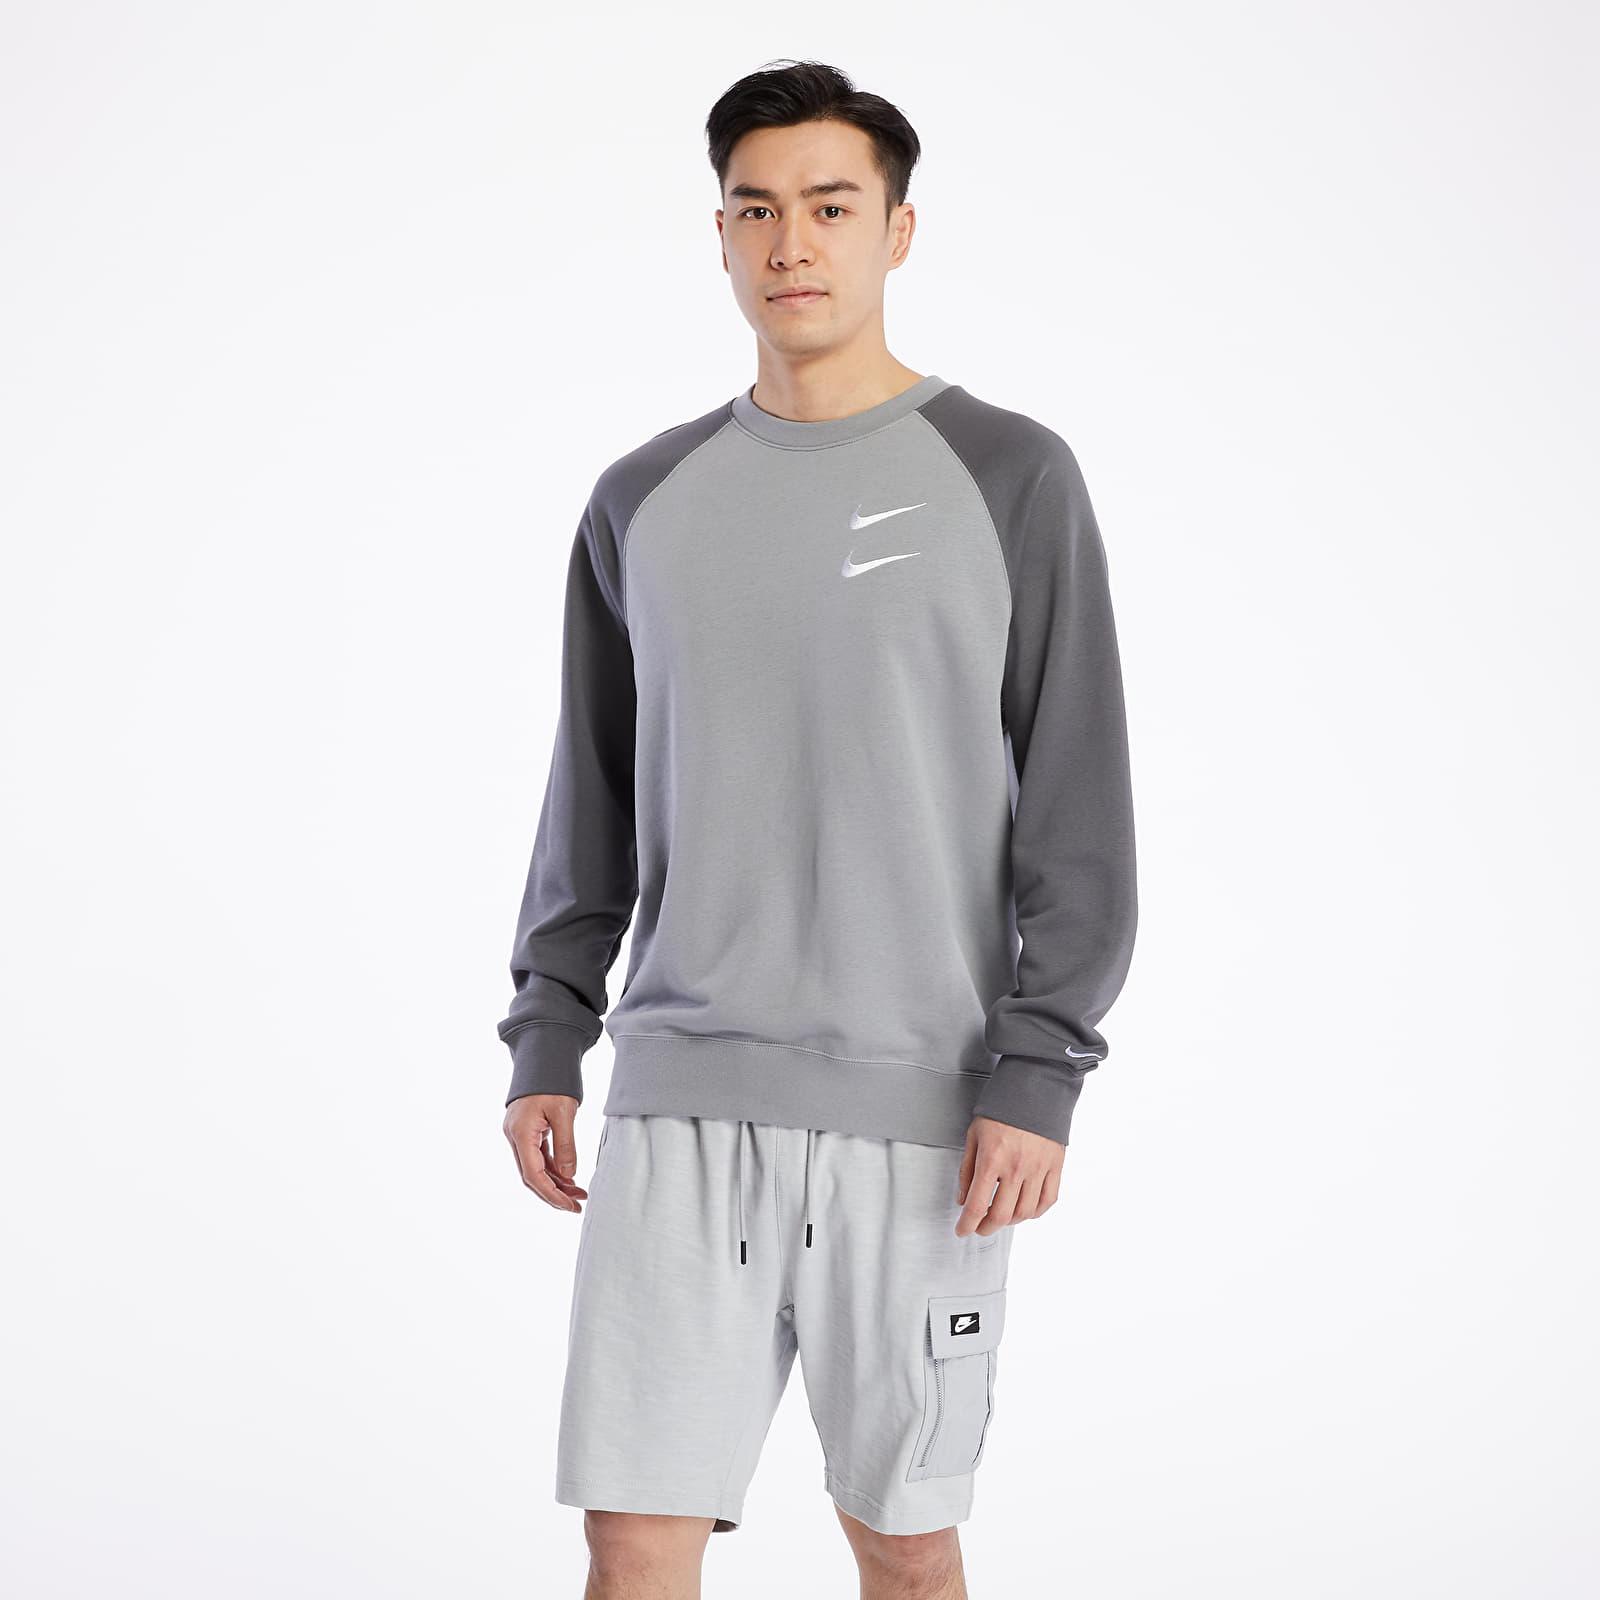 Nike Sportswear Swoosh Ft Crewneck